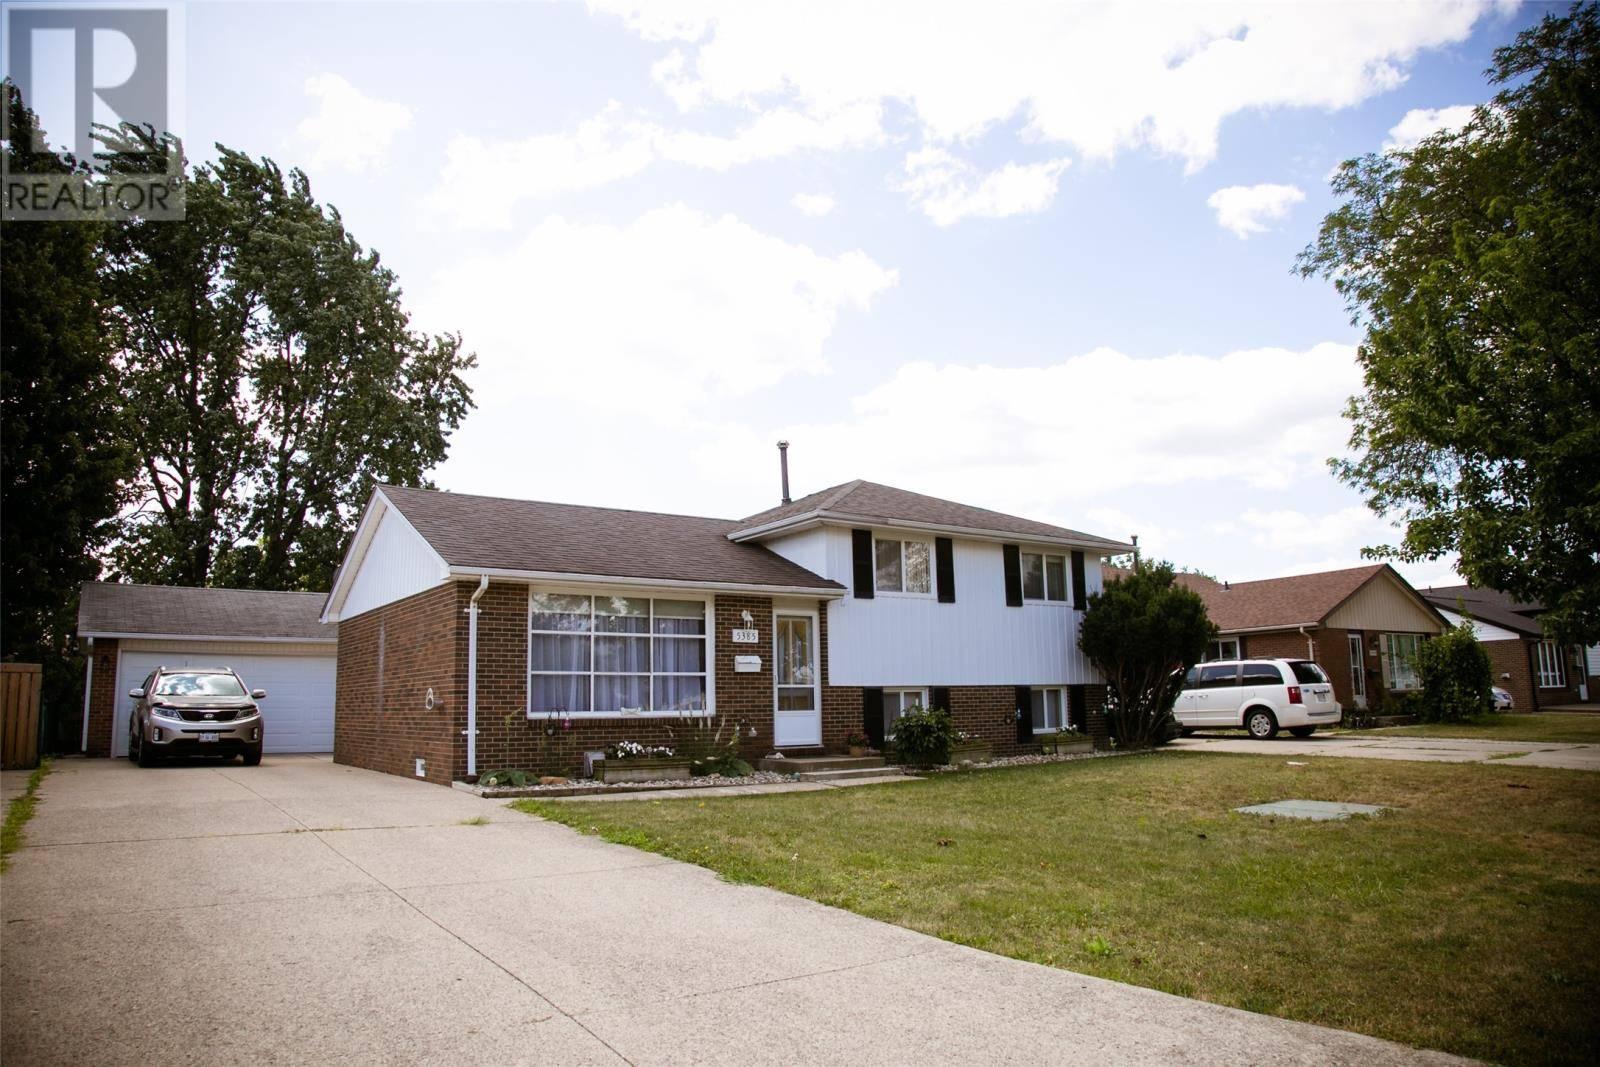 House for sale at 5385 Queen Elizabeth  Windsor Ontario - MLS: 19023368